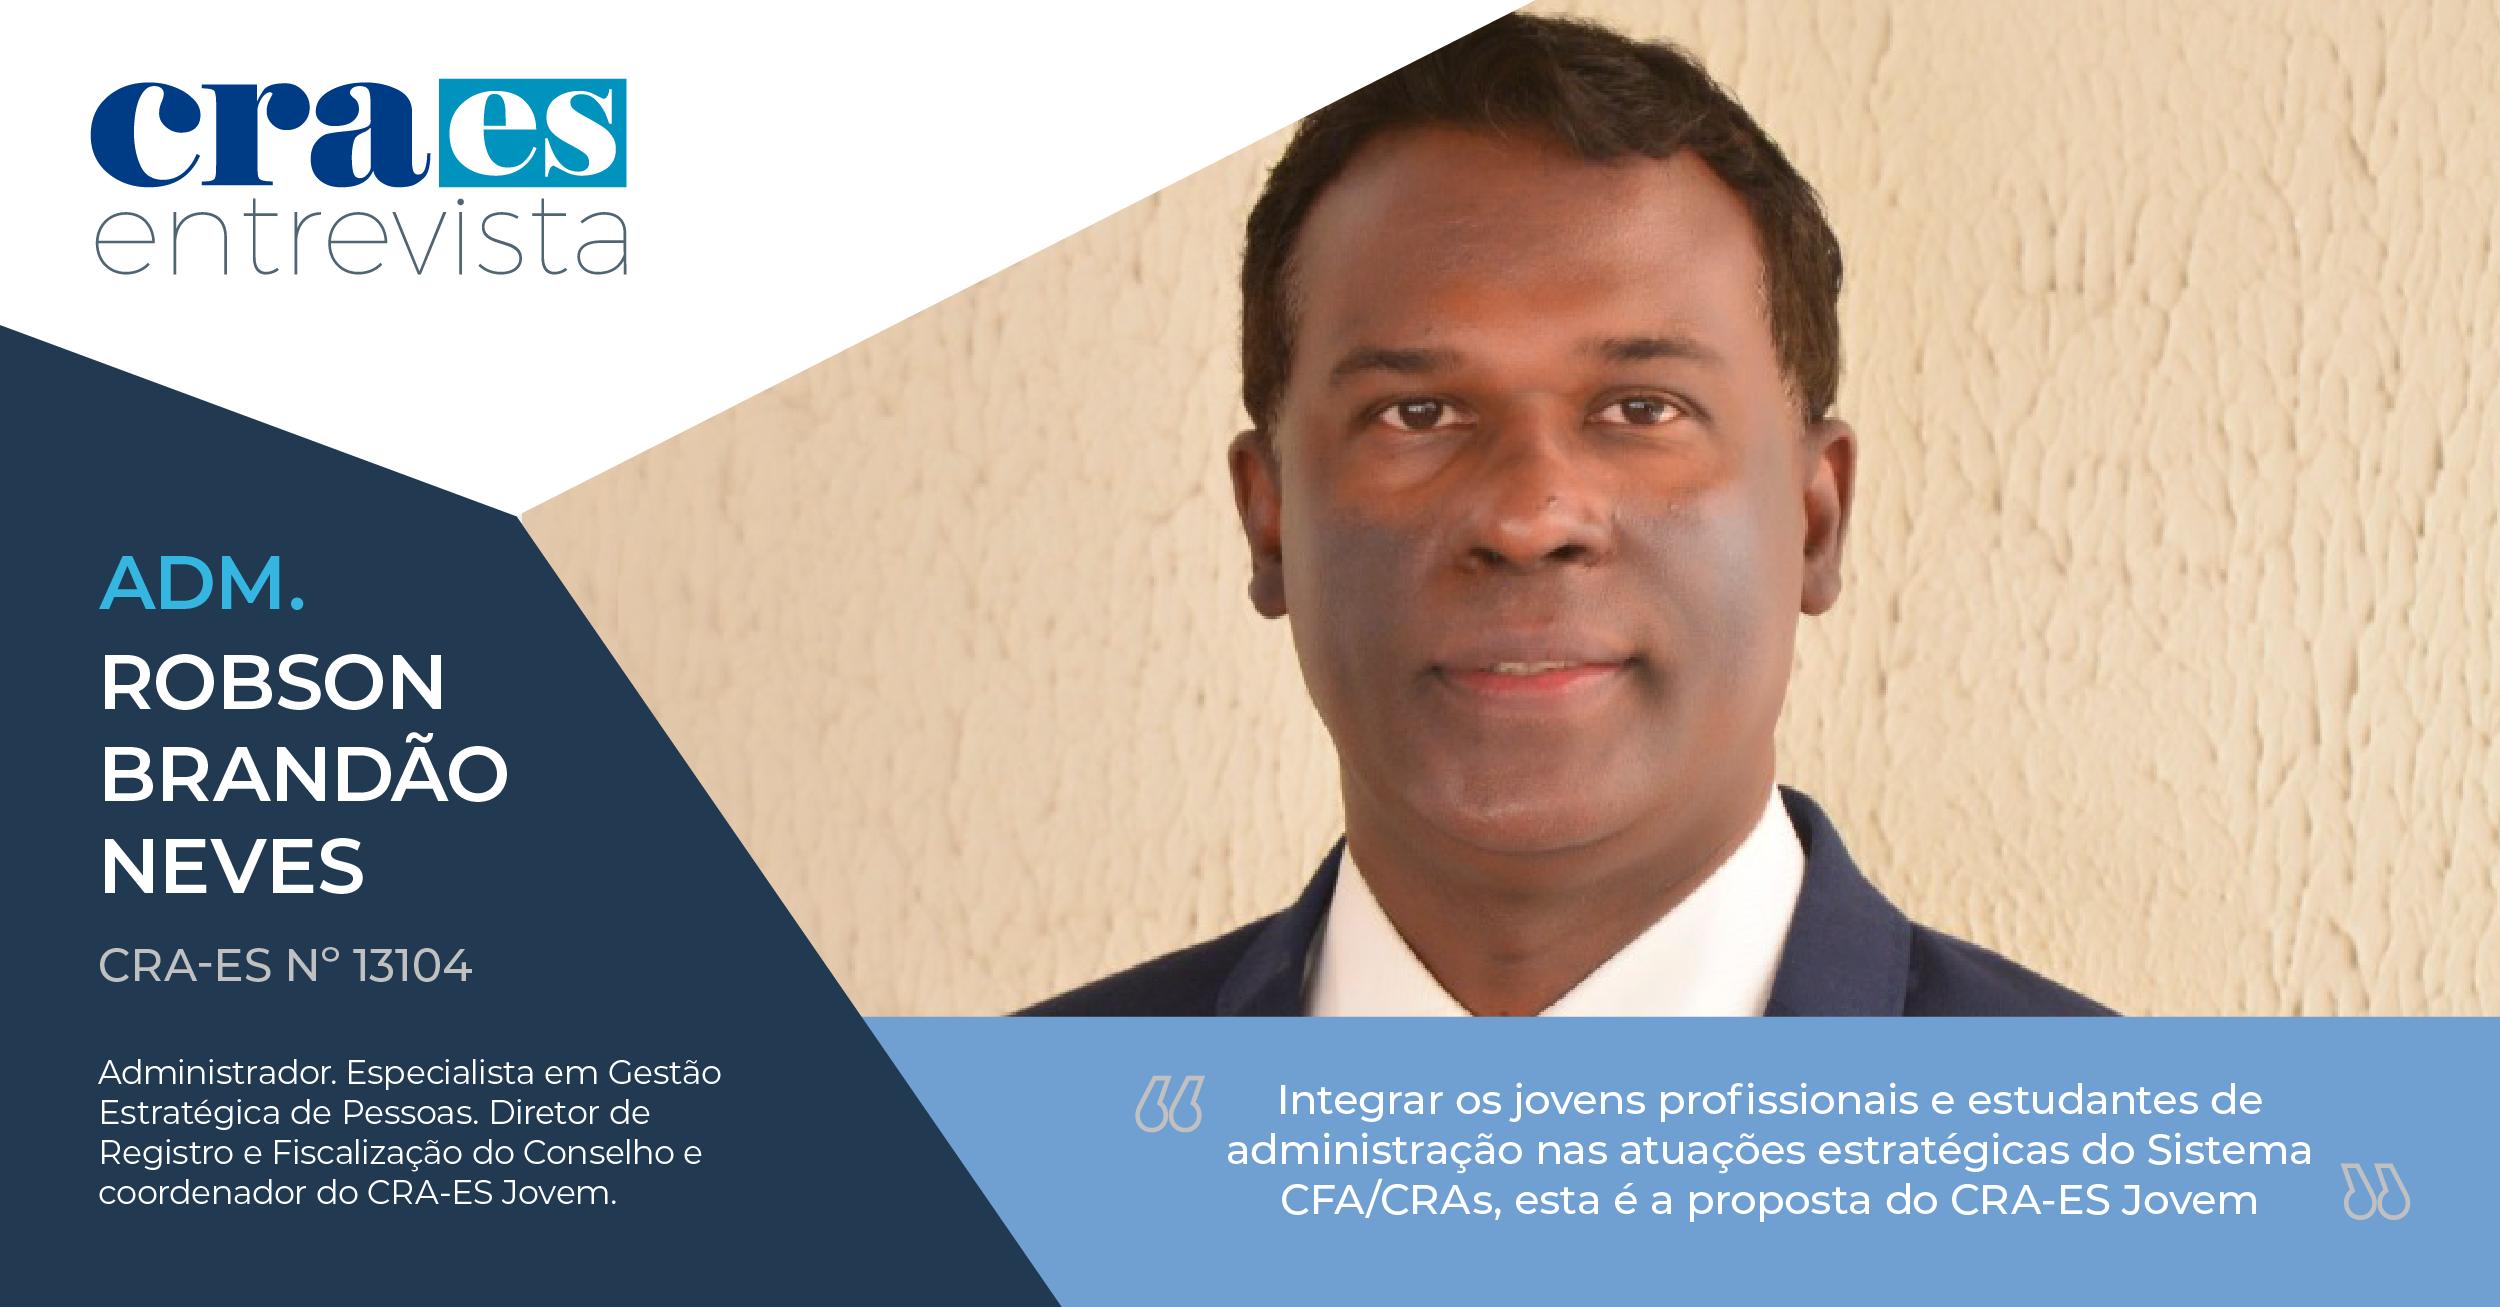 You are currently viewing CRA ENTREVISTA | Adm. Robson Brandão Neves, CRA-ES 13104